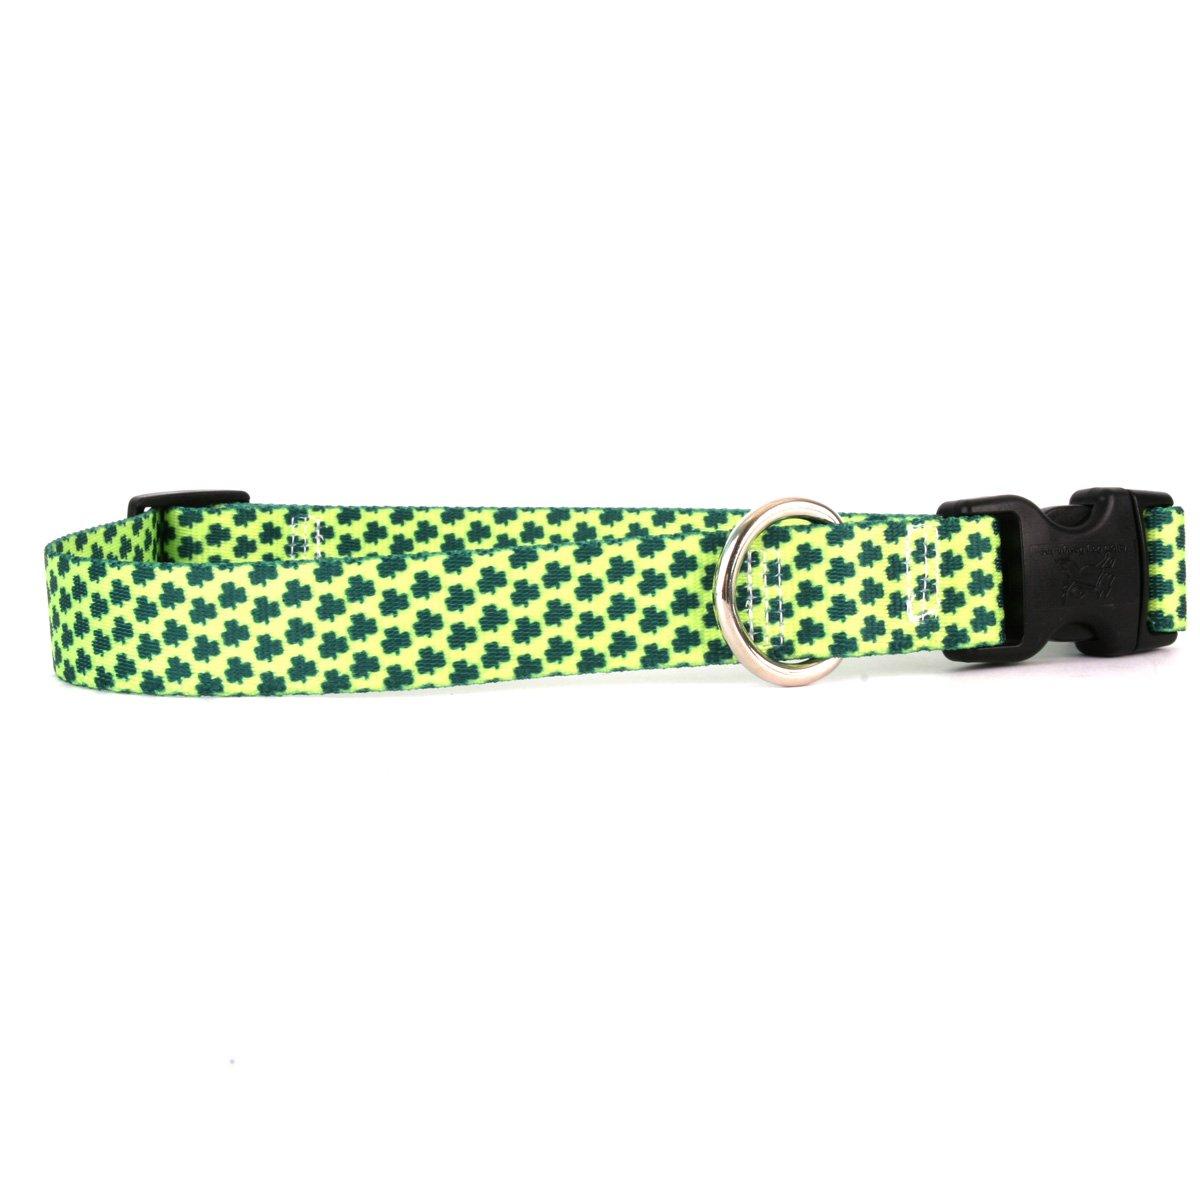 Yellow Dog Design 4 Leaf Clover Dog Collar Fits Neck 14 to 20//4 Wide Medium 3//4 Wide